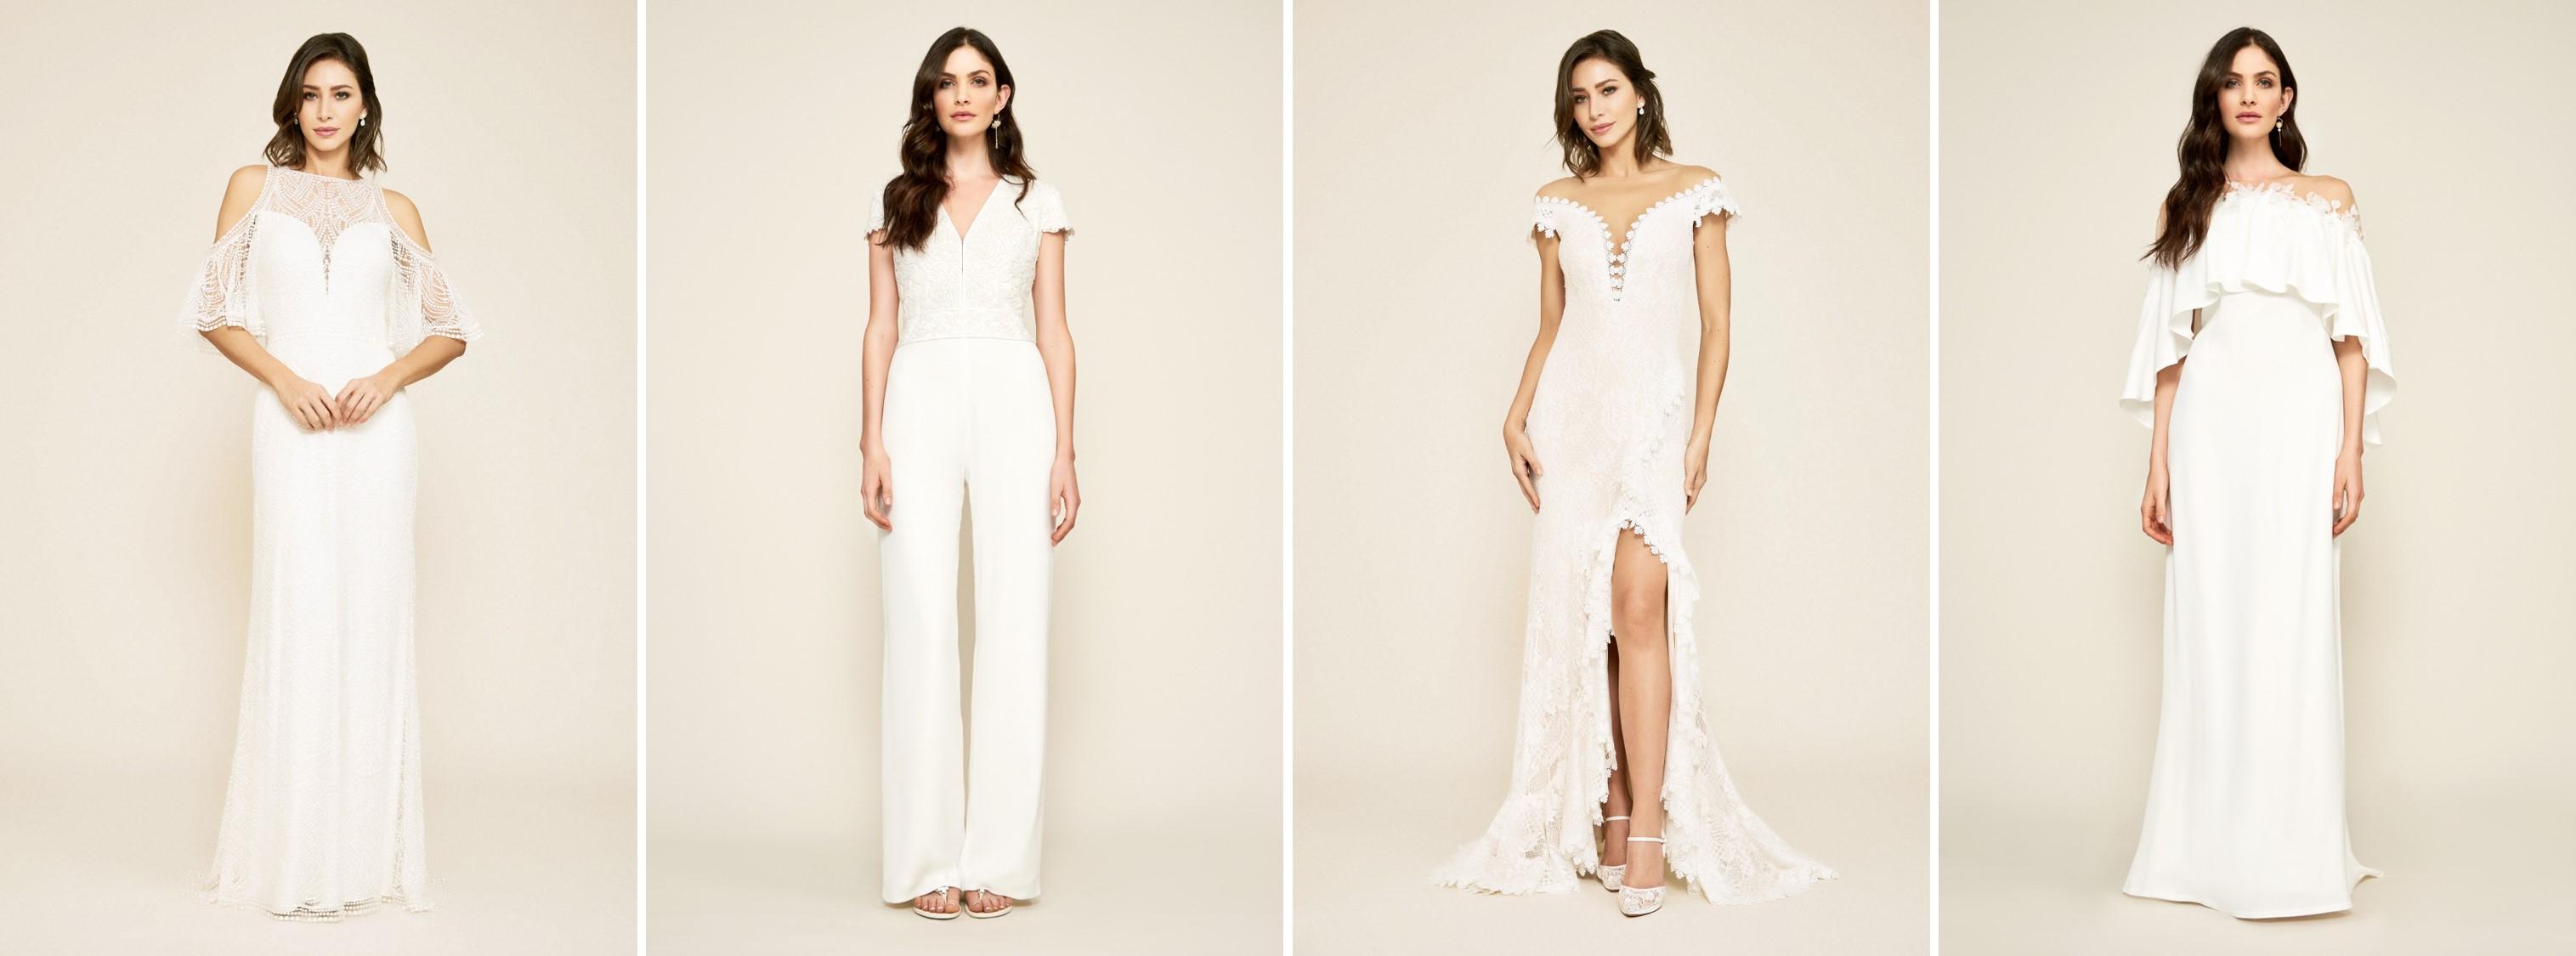 Models wearing long white bohemian wedding dresses by Tadashi Shoji at David's Bridal